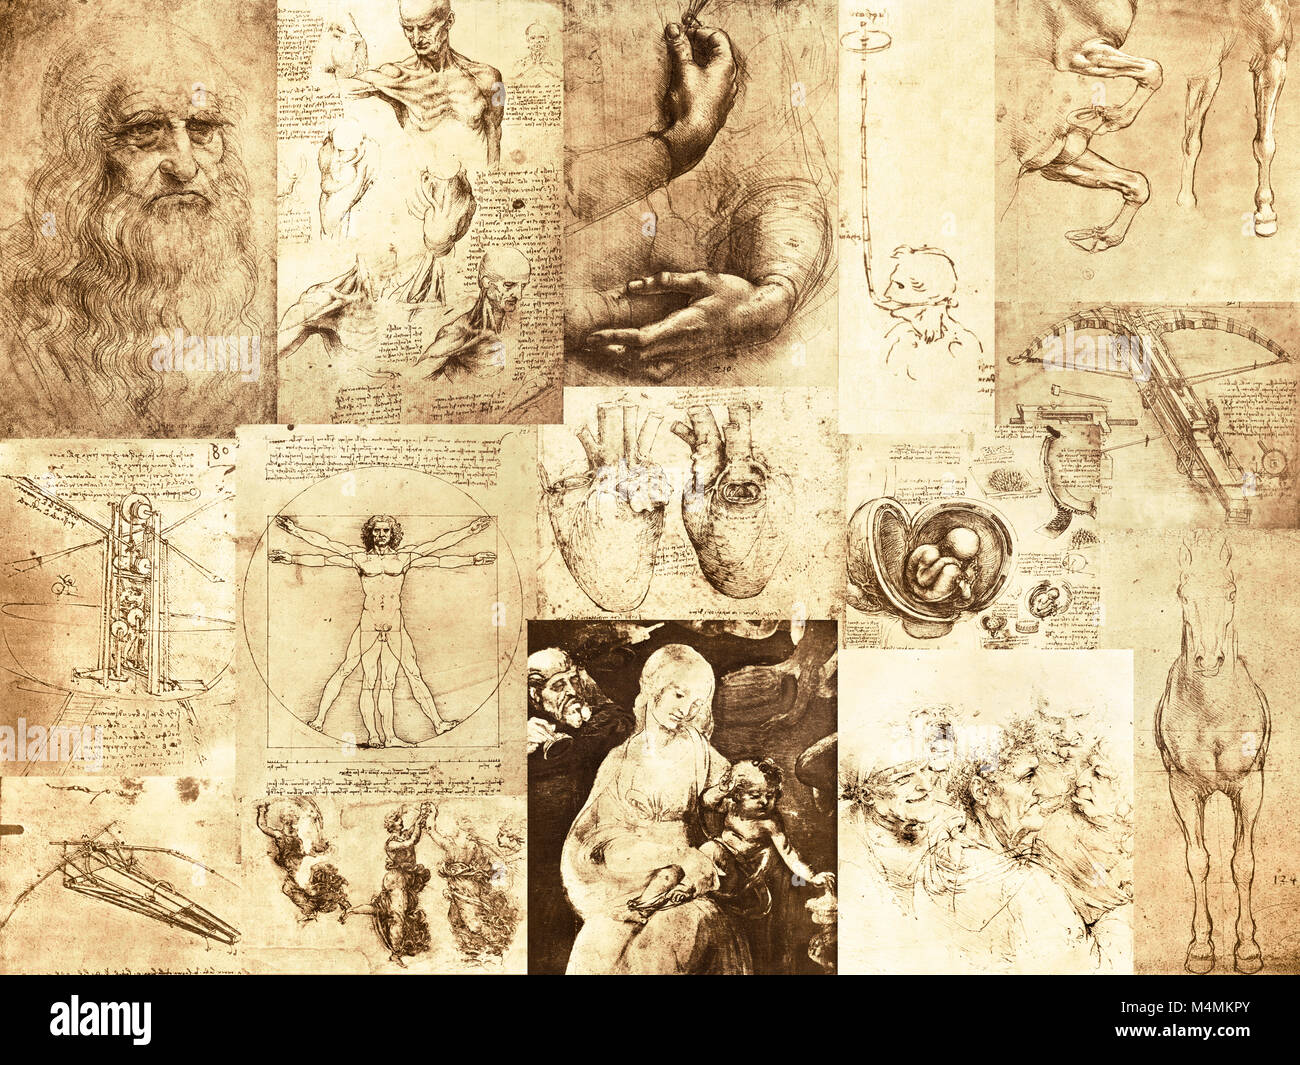 the inventive mind of Leonardo Da Vinci, 1452–1519, - Stock Image